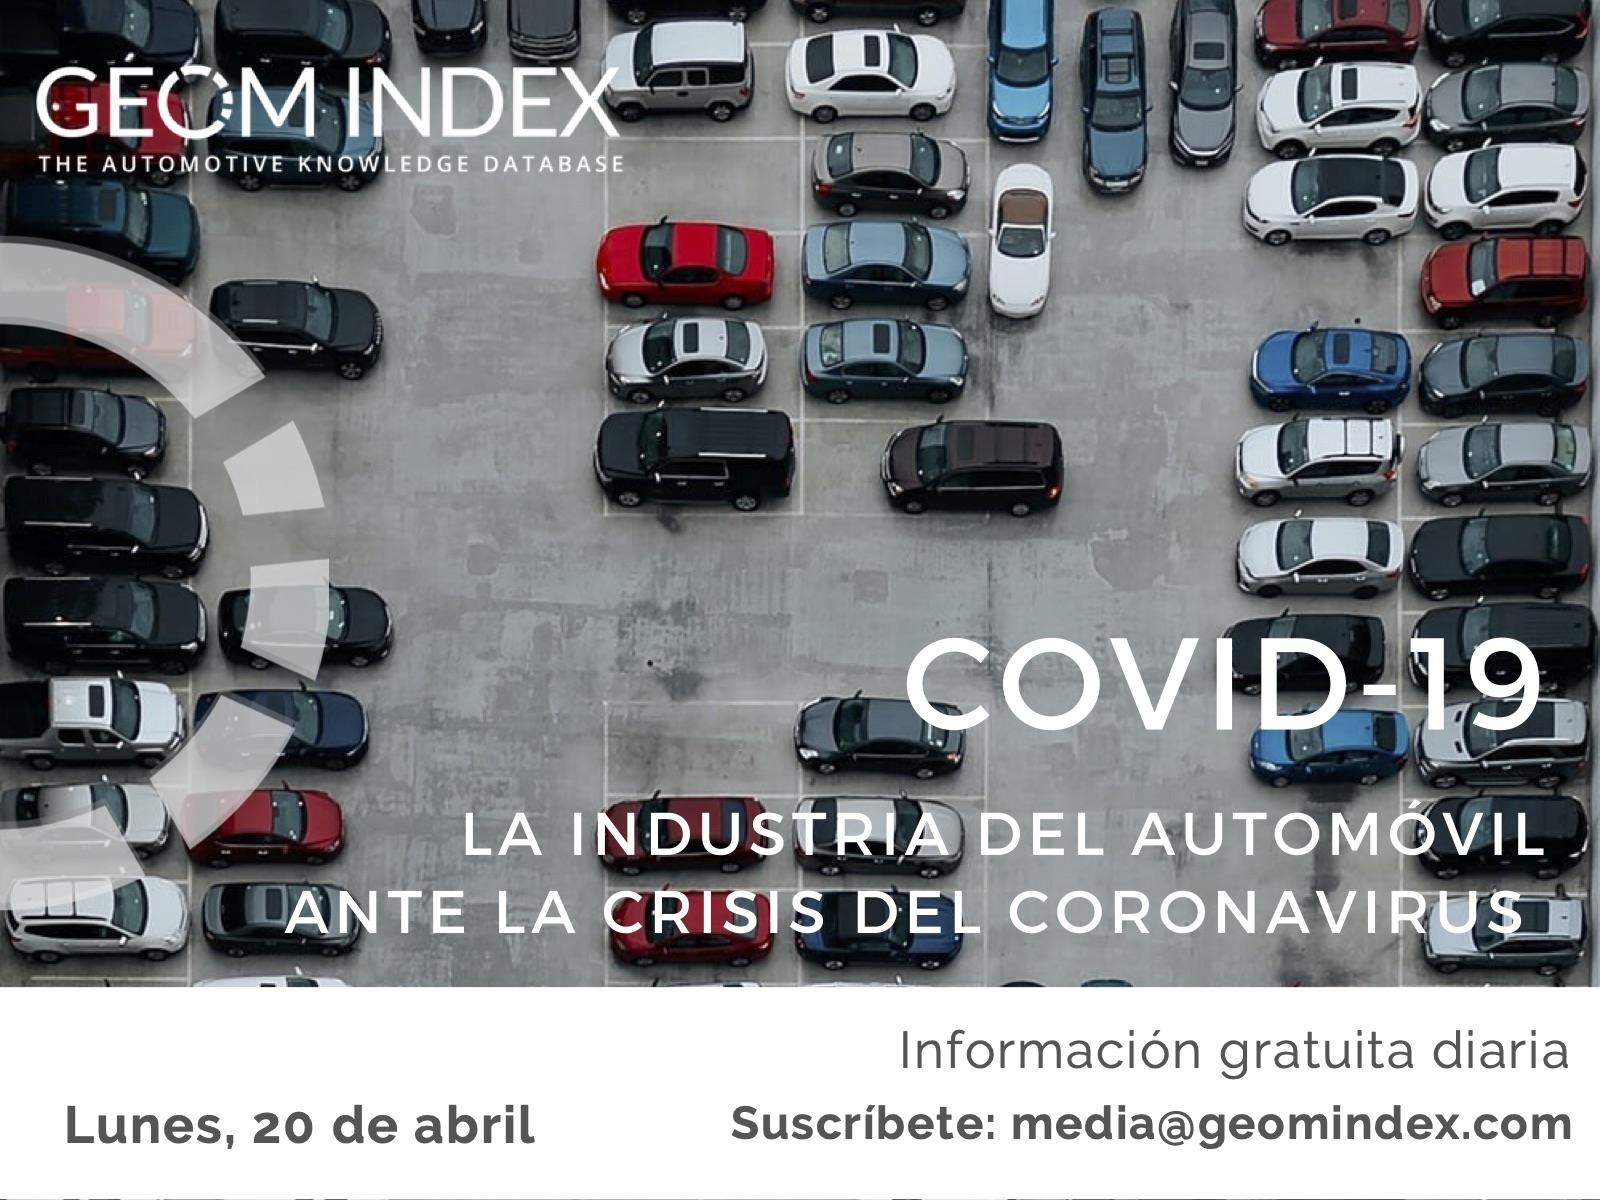 Informe 20 de abril – La industria del automóvil ante la crisis del Covid-19